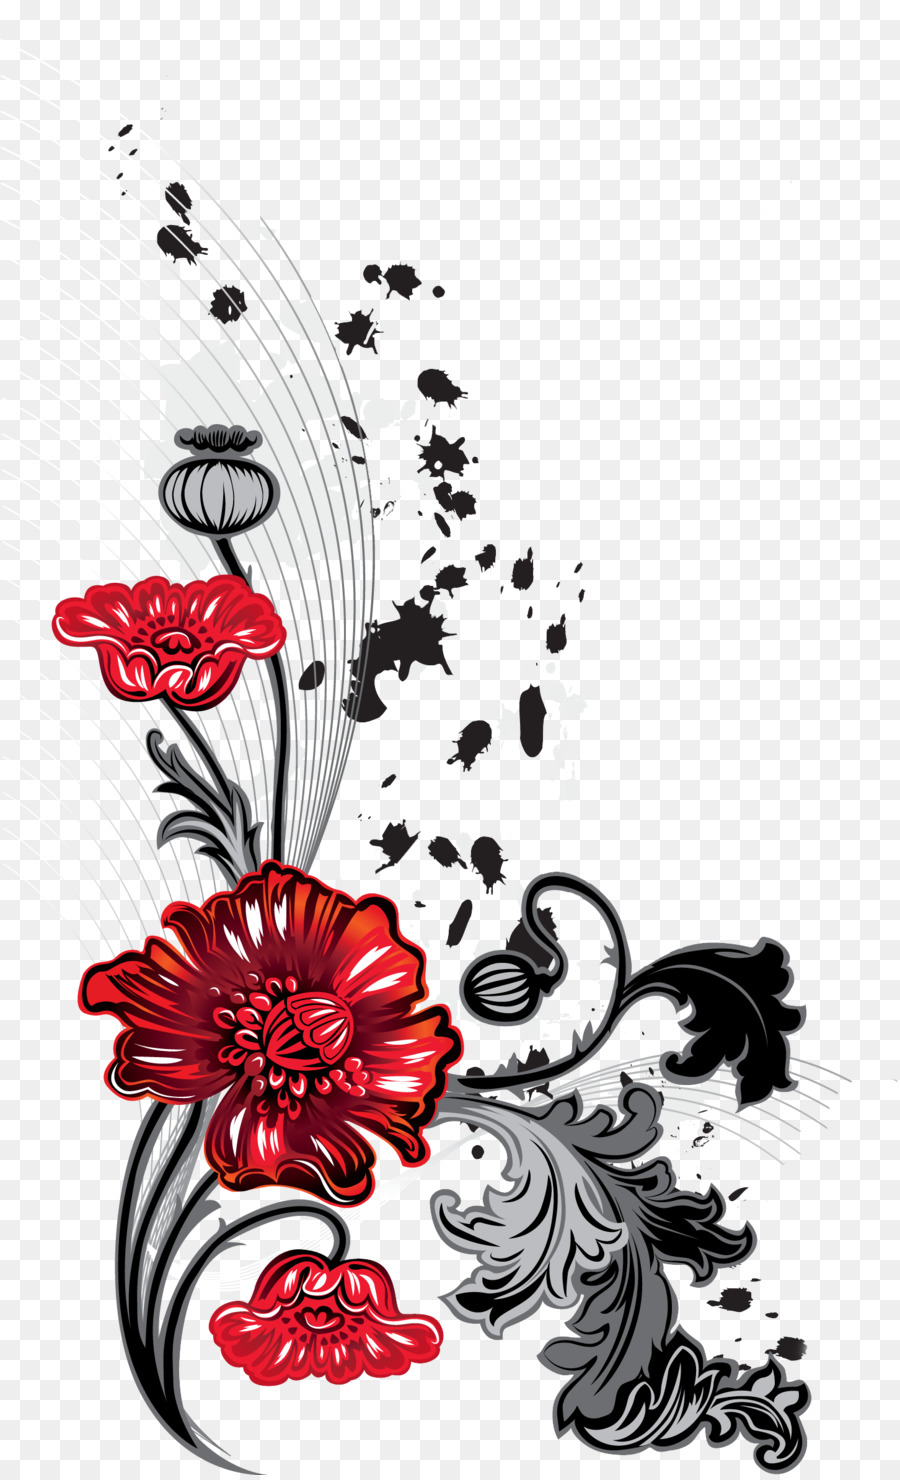 kisspng desktop wallpaper animation flower ornaments 5acf9ad99f1ef7.6158765115235550336518